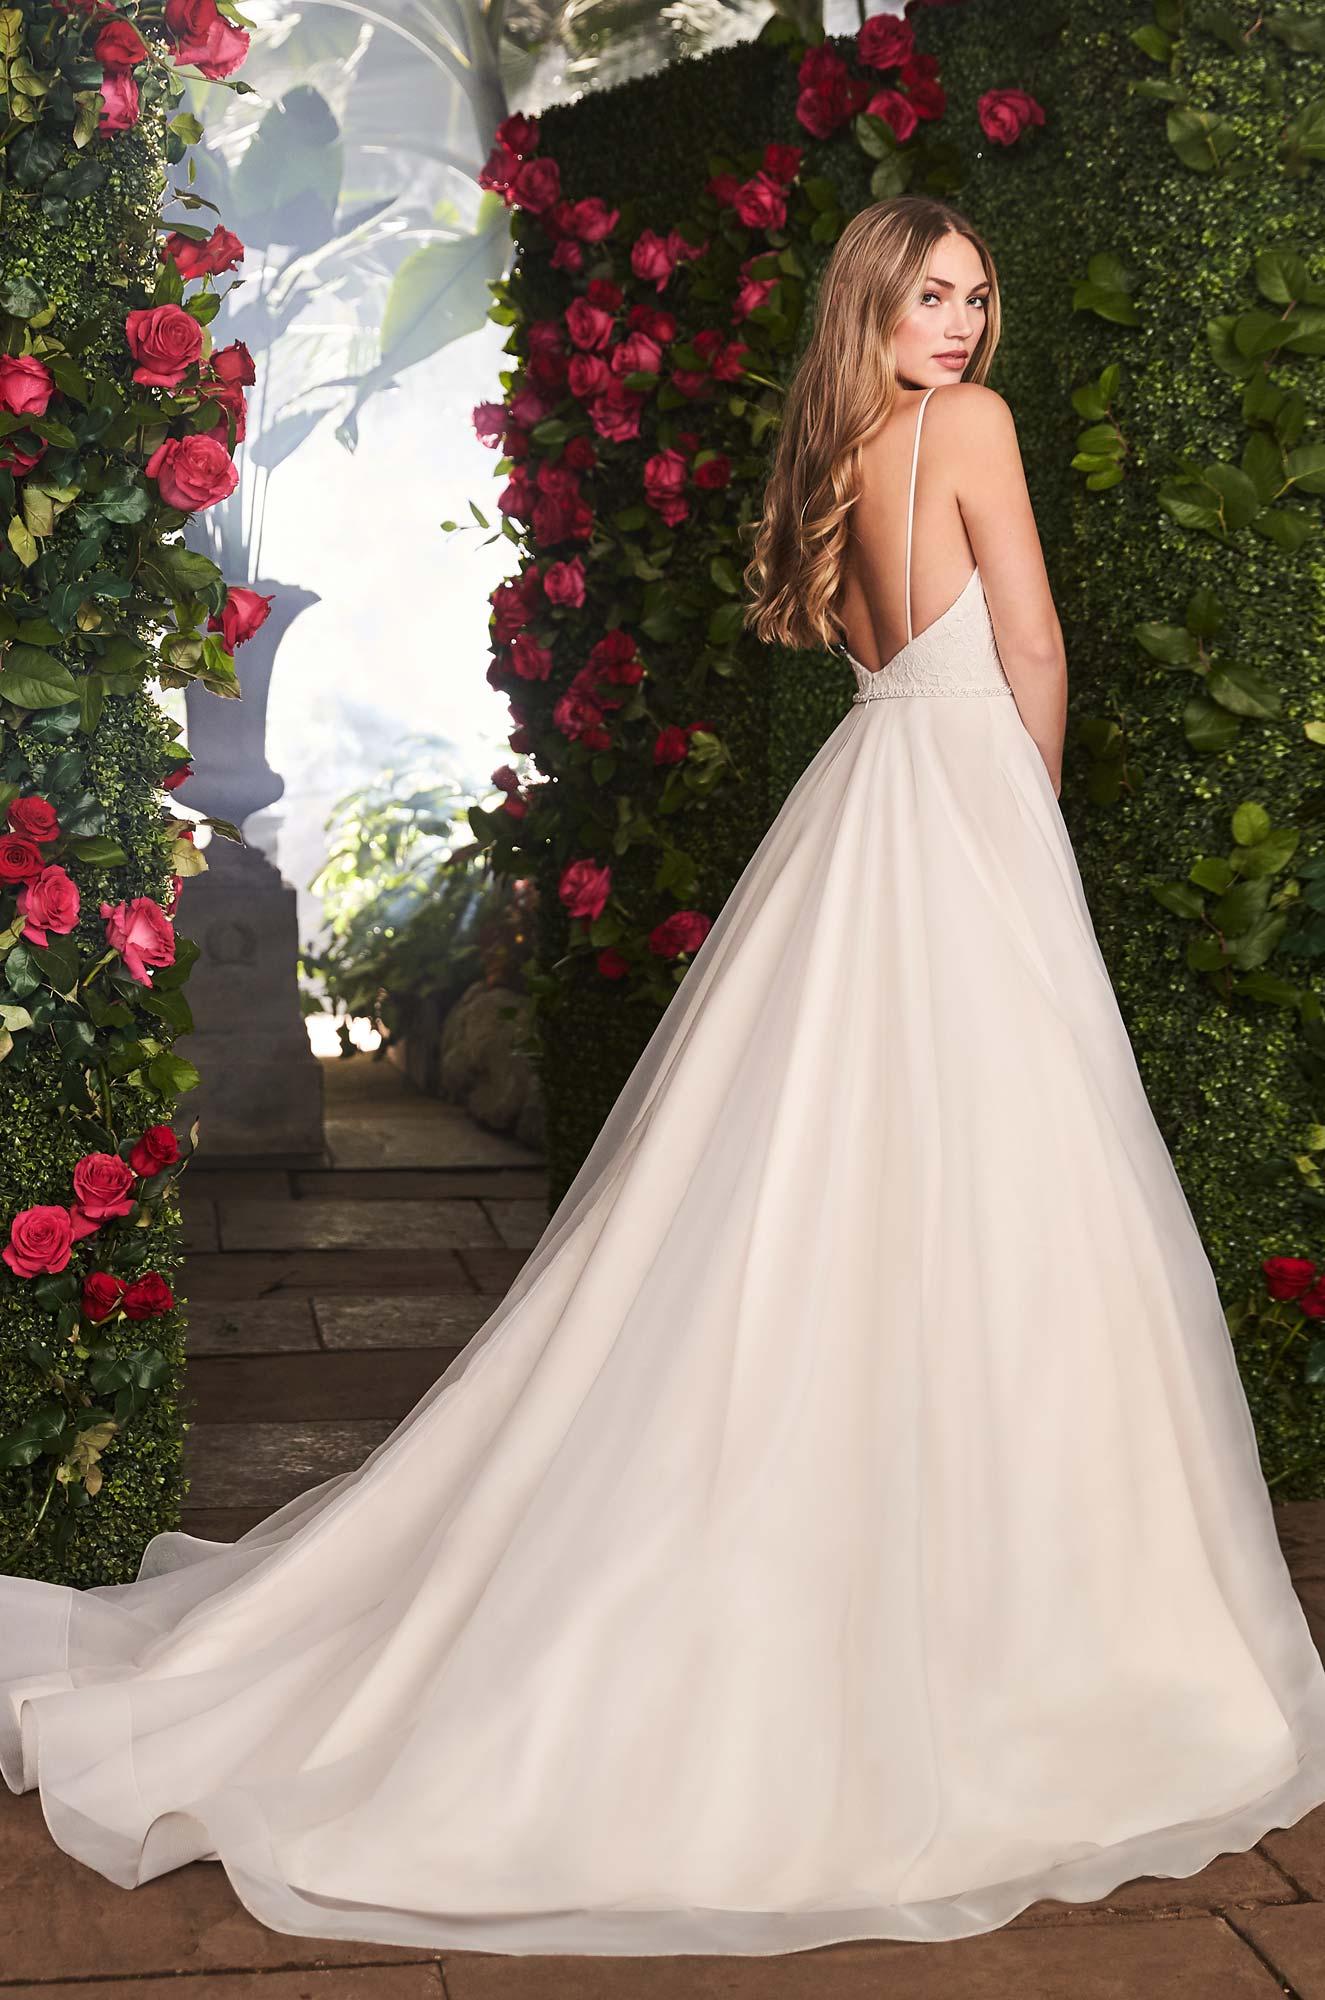 Scoop Neckline Wedding Dress - Style #2256 | Mikaella Bridal